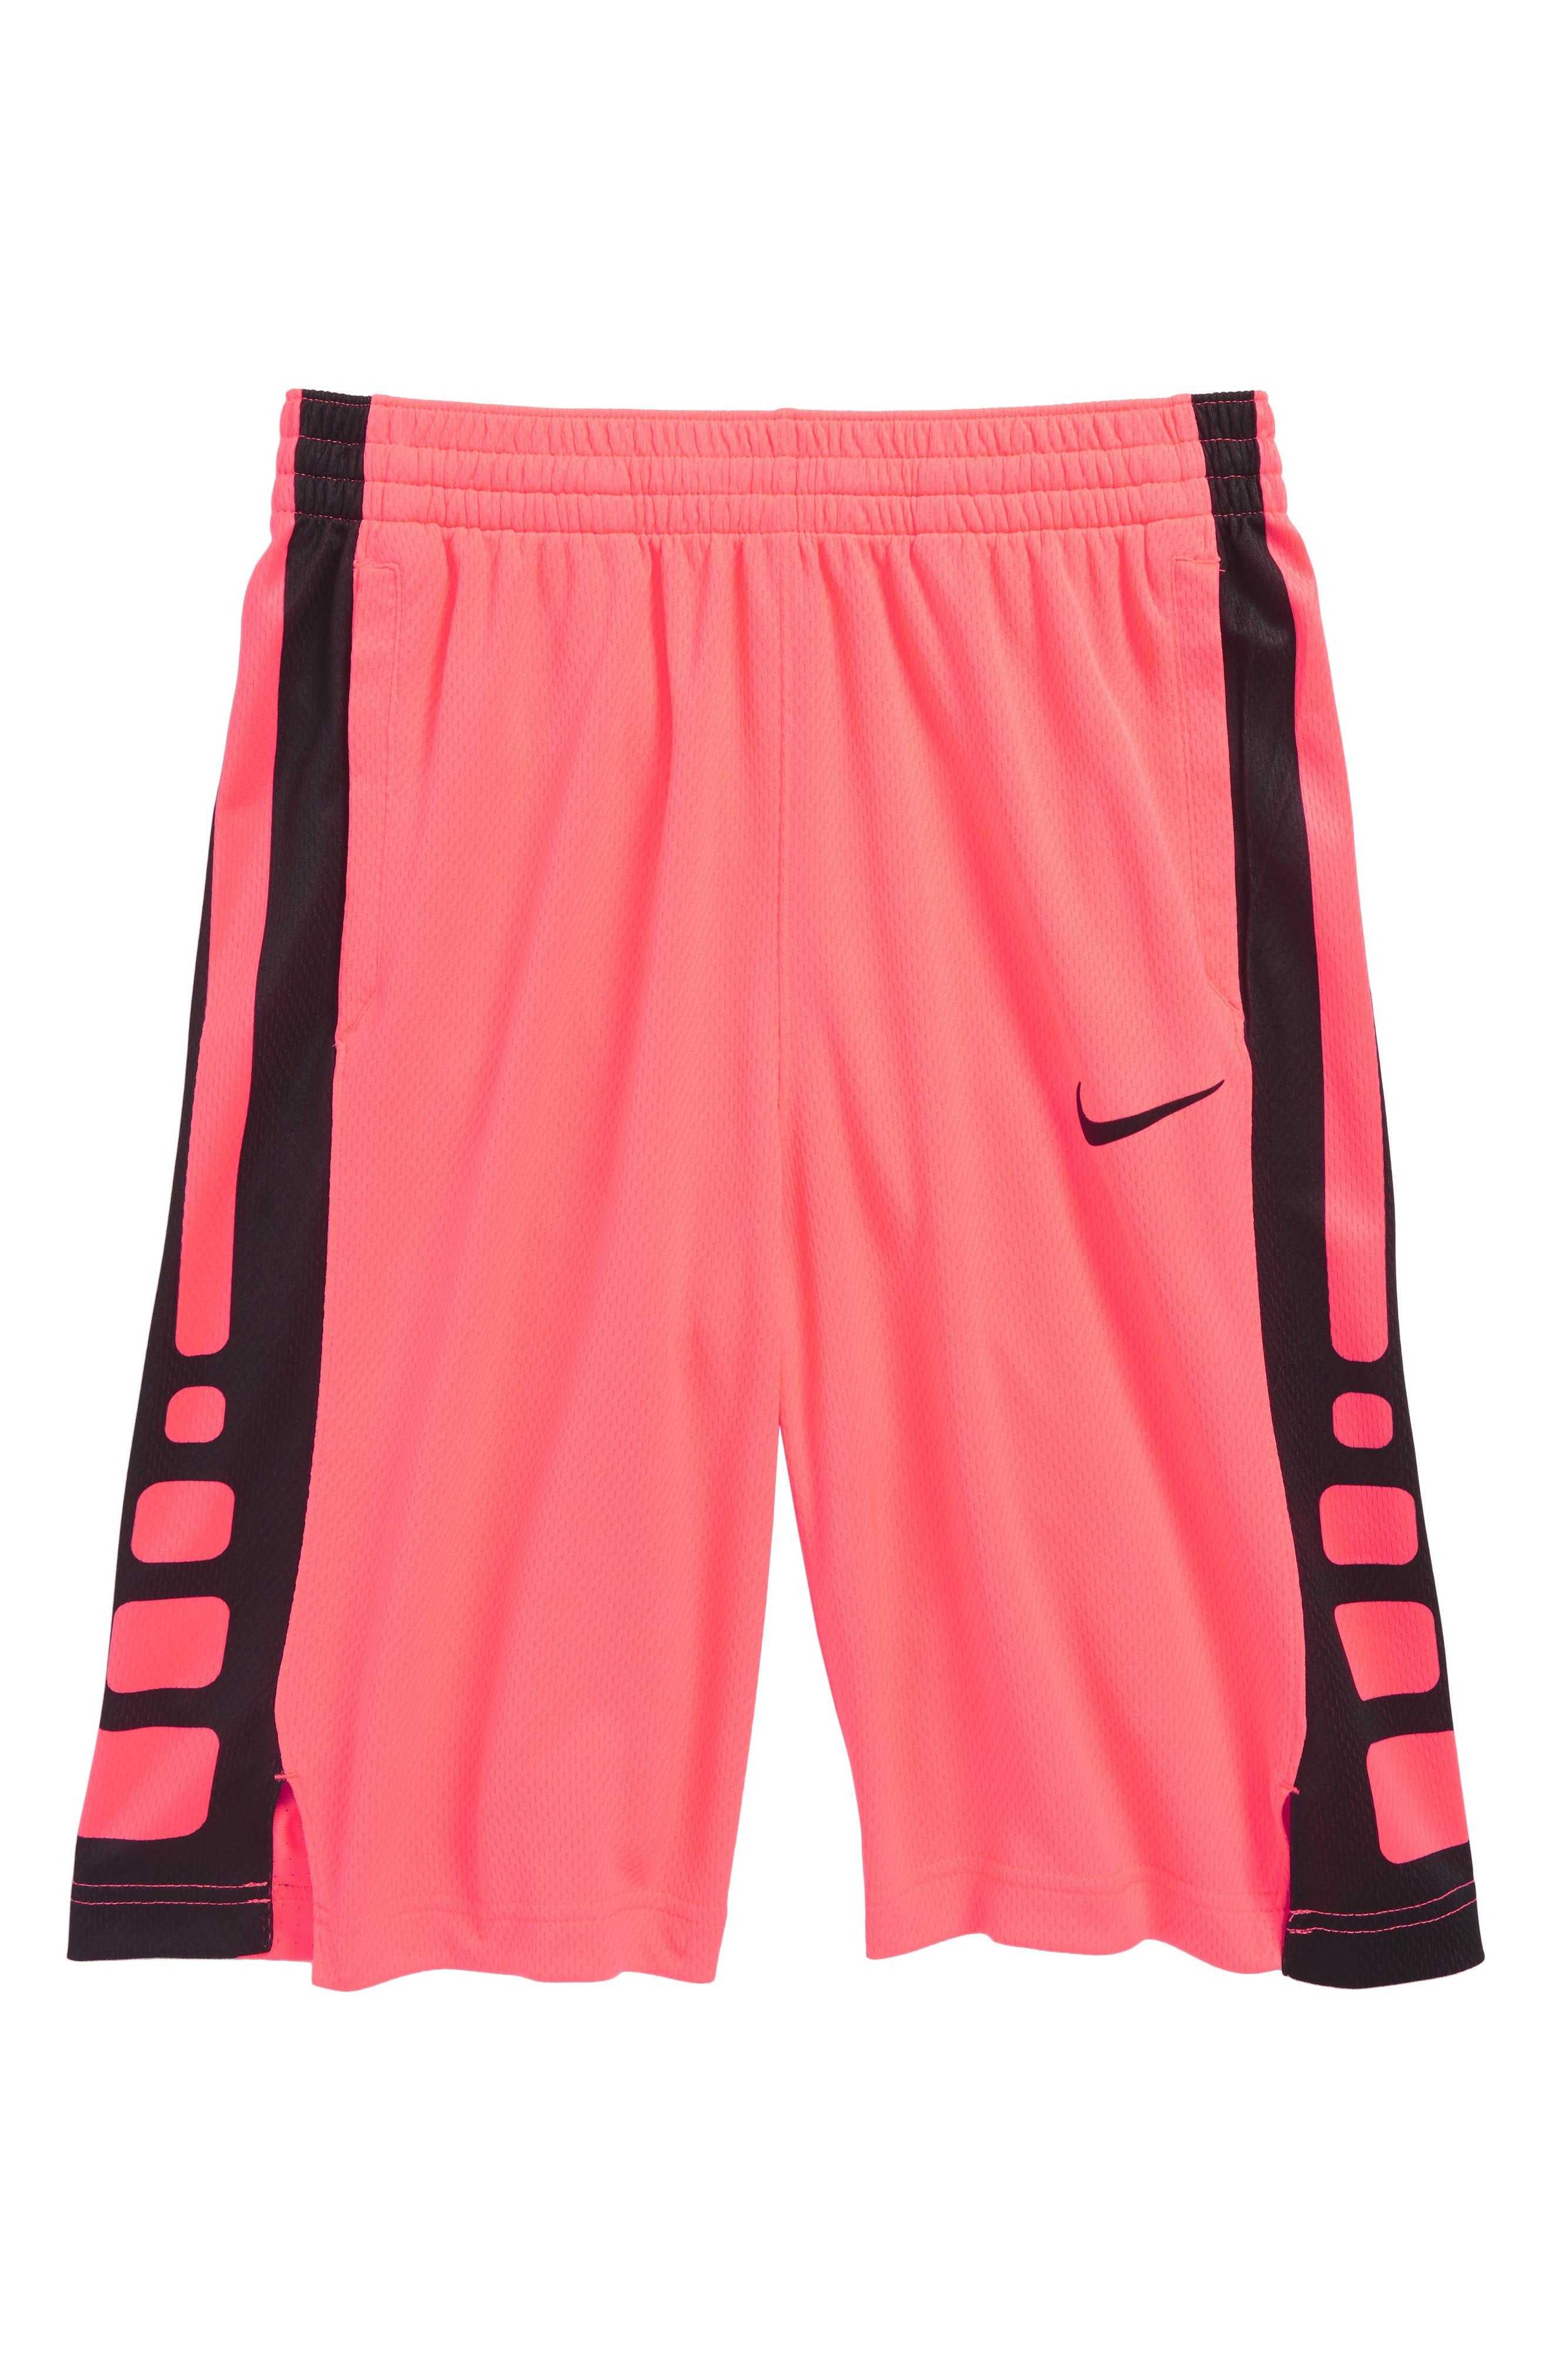 Dry Elite Basketball Shorts,                         Main,                         color, Hot Punch/ Black